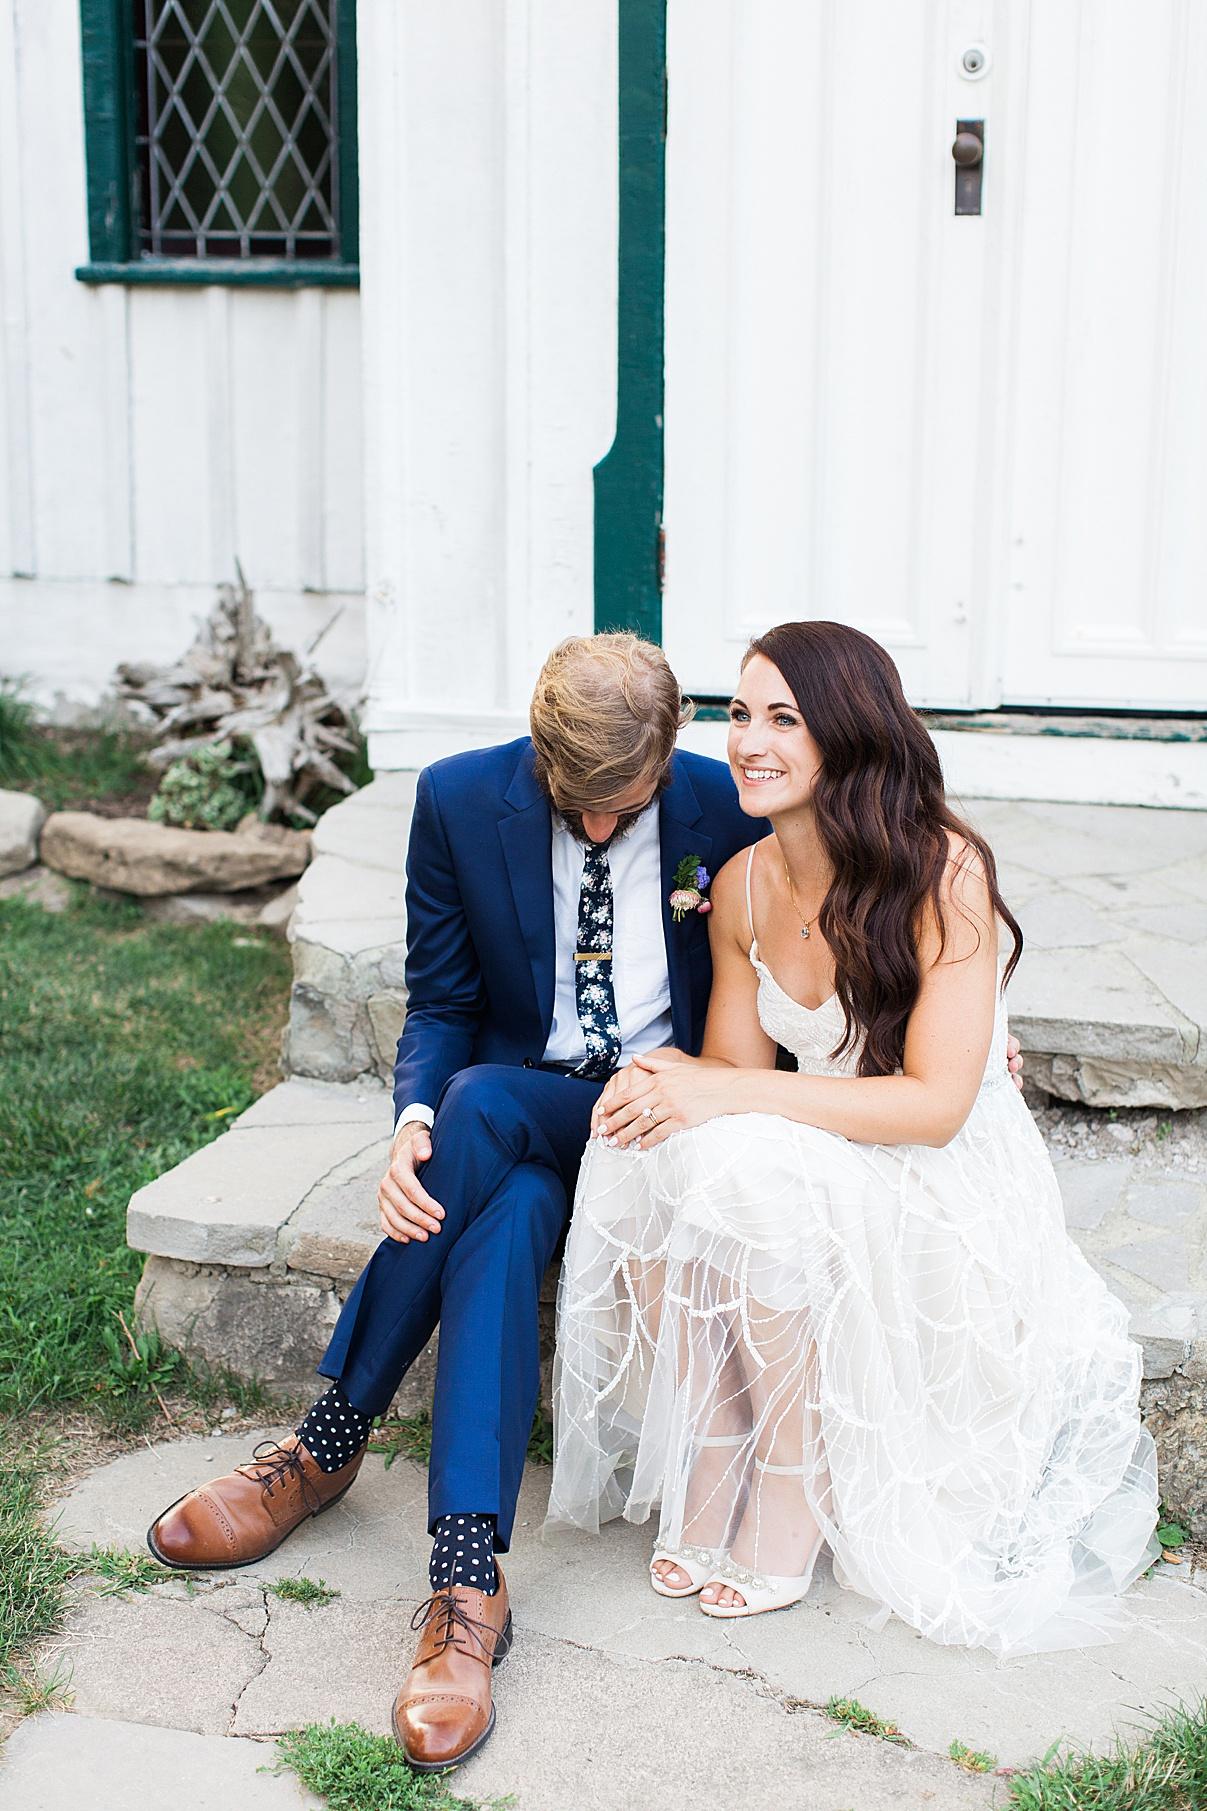 Bride and groom laughing on porch | Balls Falls, Ontario Wedding| Ontario Wedding Photographer| Toronto Wedding Photographer| 3Photography| 3photography.ca